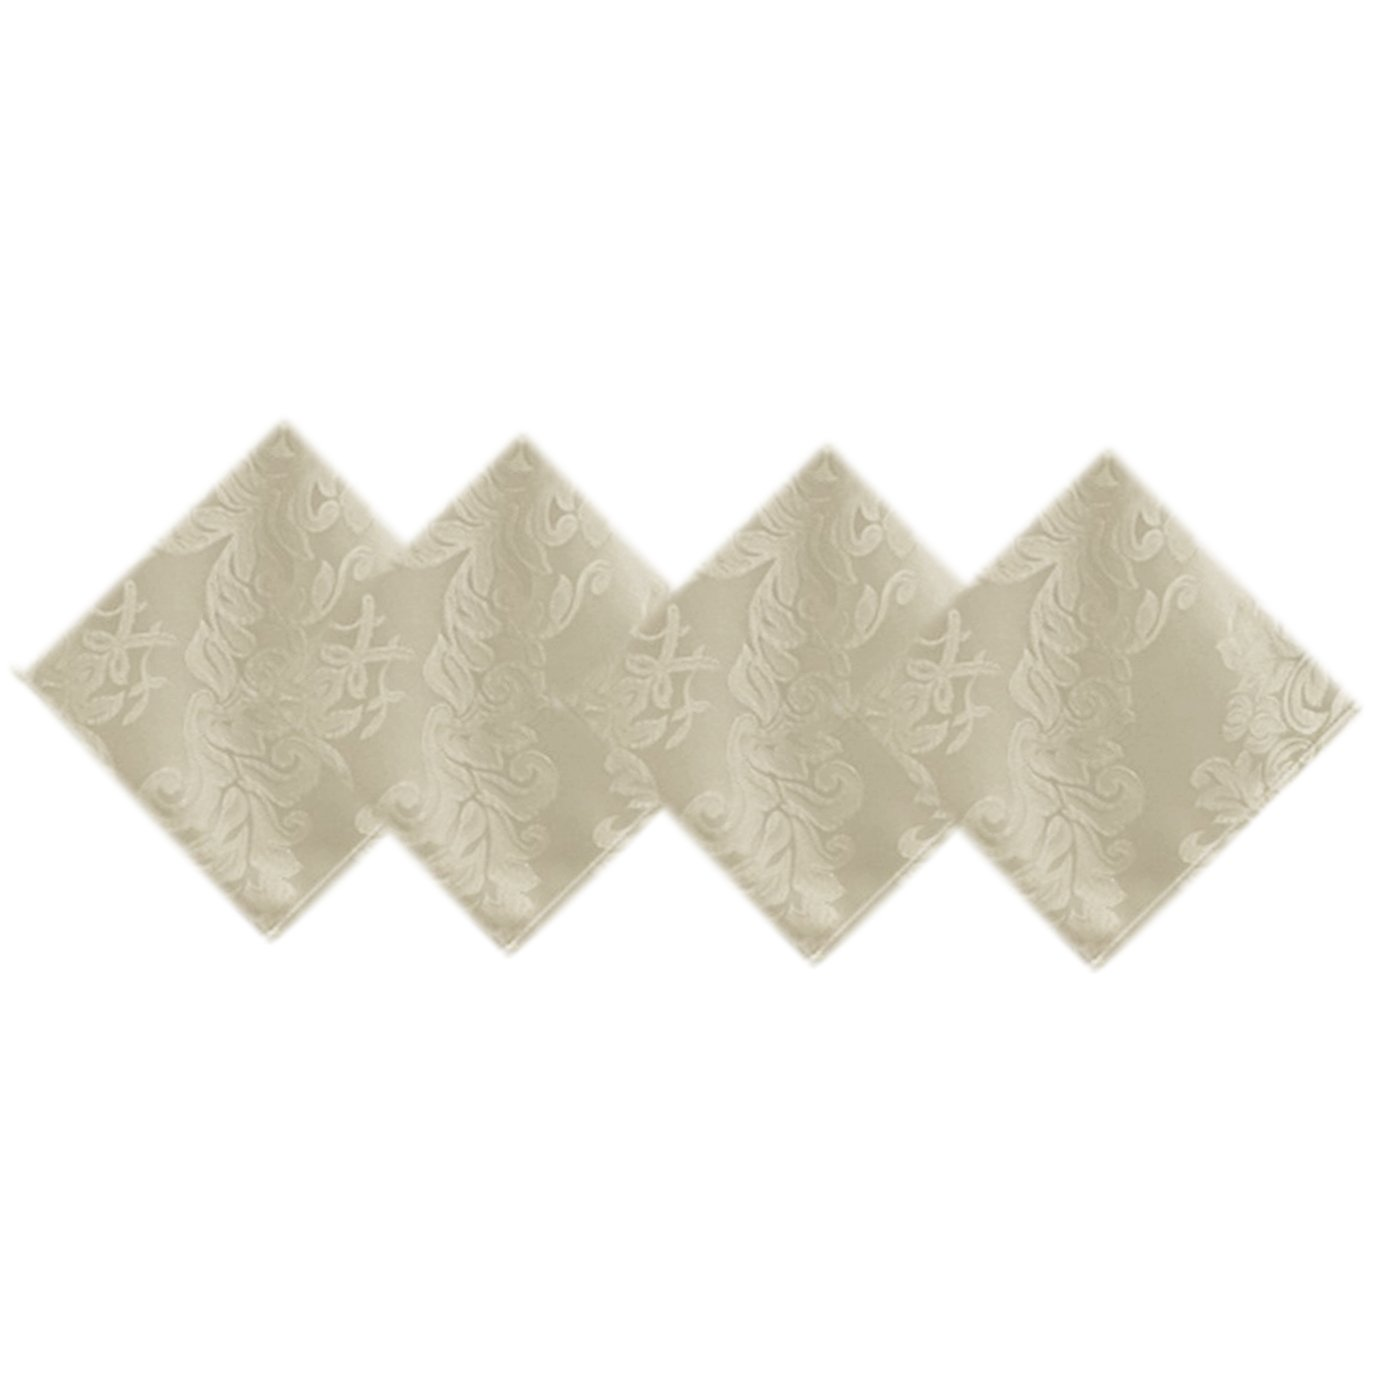 Newbridge Barcelona Damask Weave Fabric Napkin Clearance Sale, No-Iron and Soil Resistant Set of 4 Napkins, Antique White